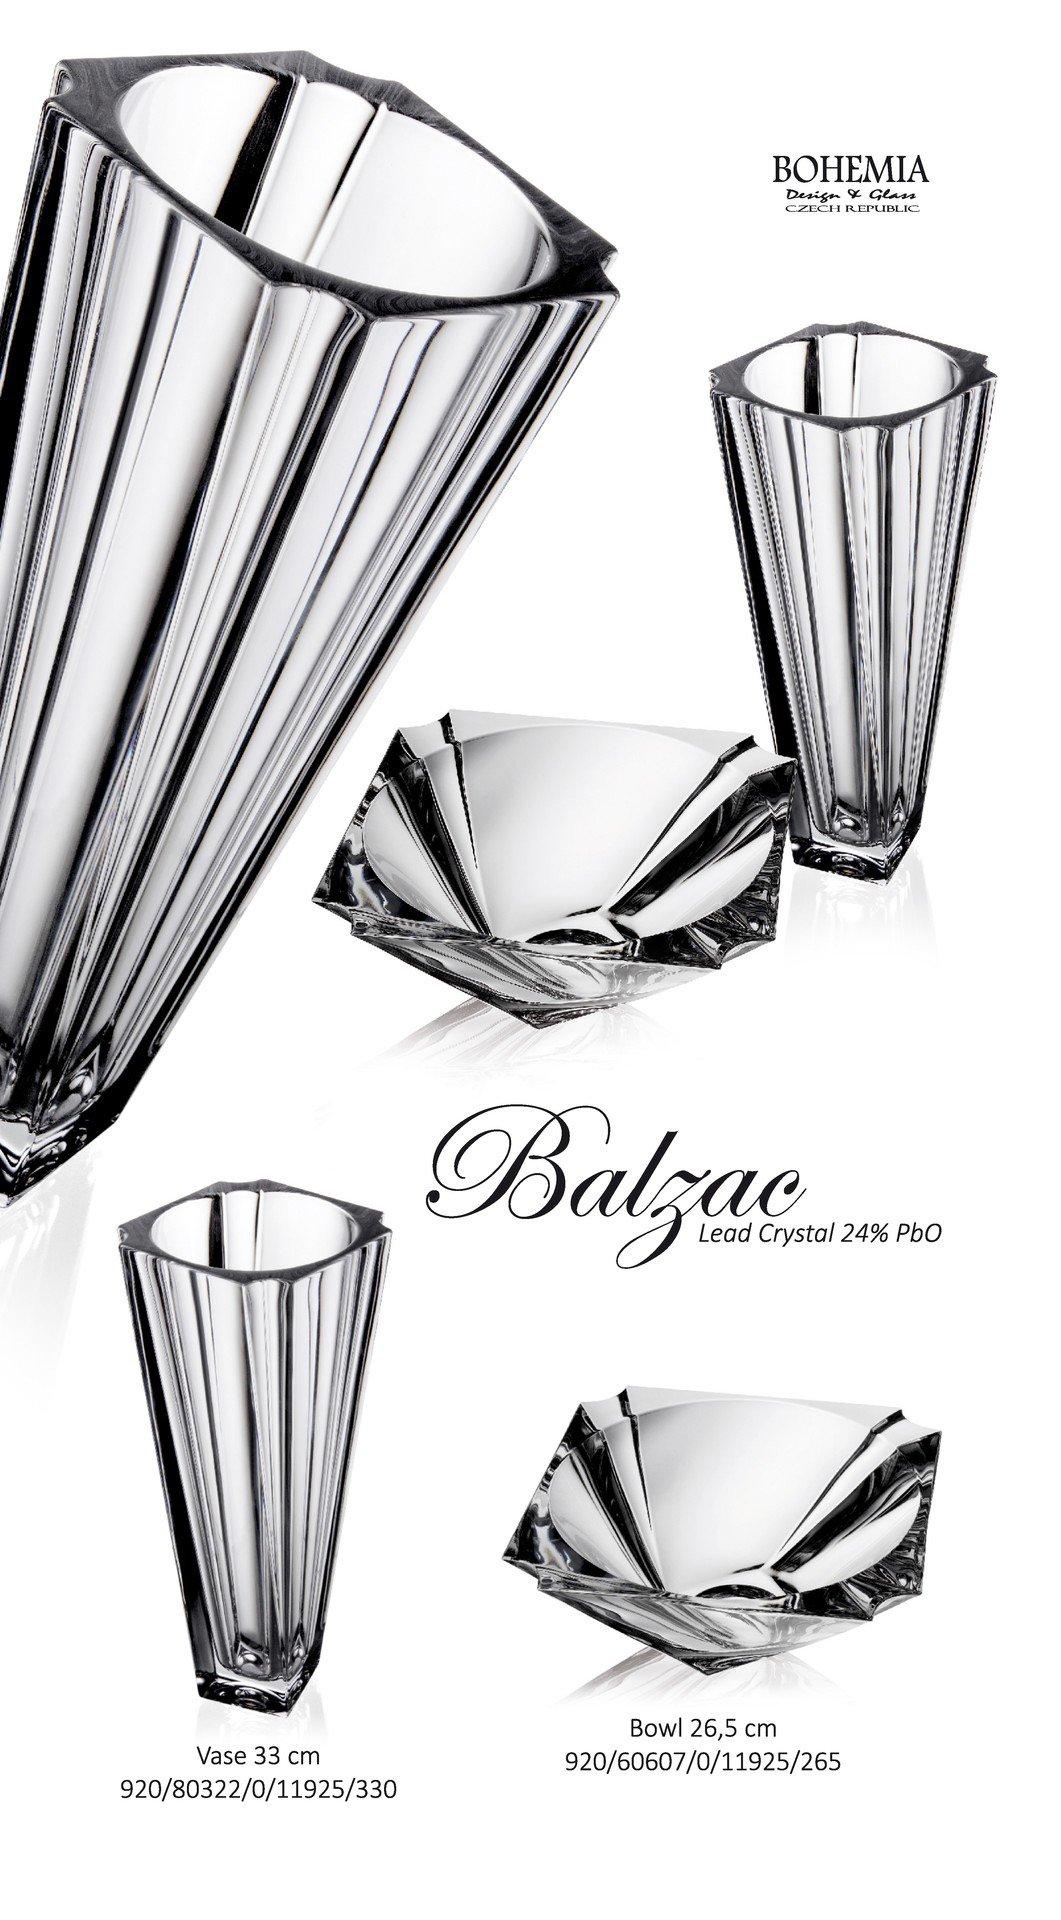 Decorative Crystal Flower Vase ''Balzac'' 13-in, Clear Elegant Centerpiece Bud